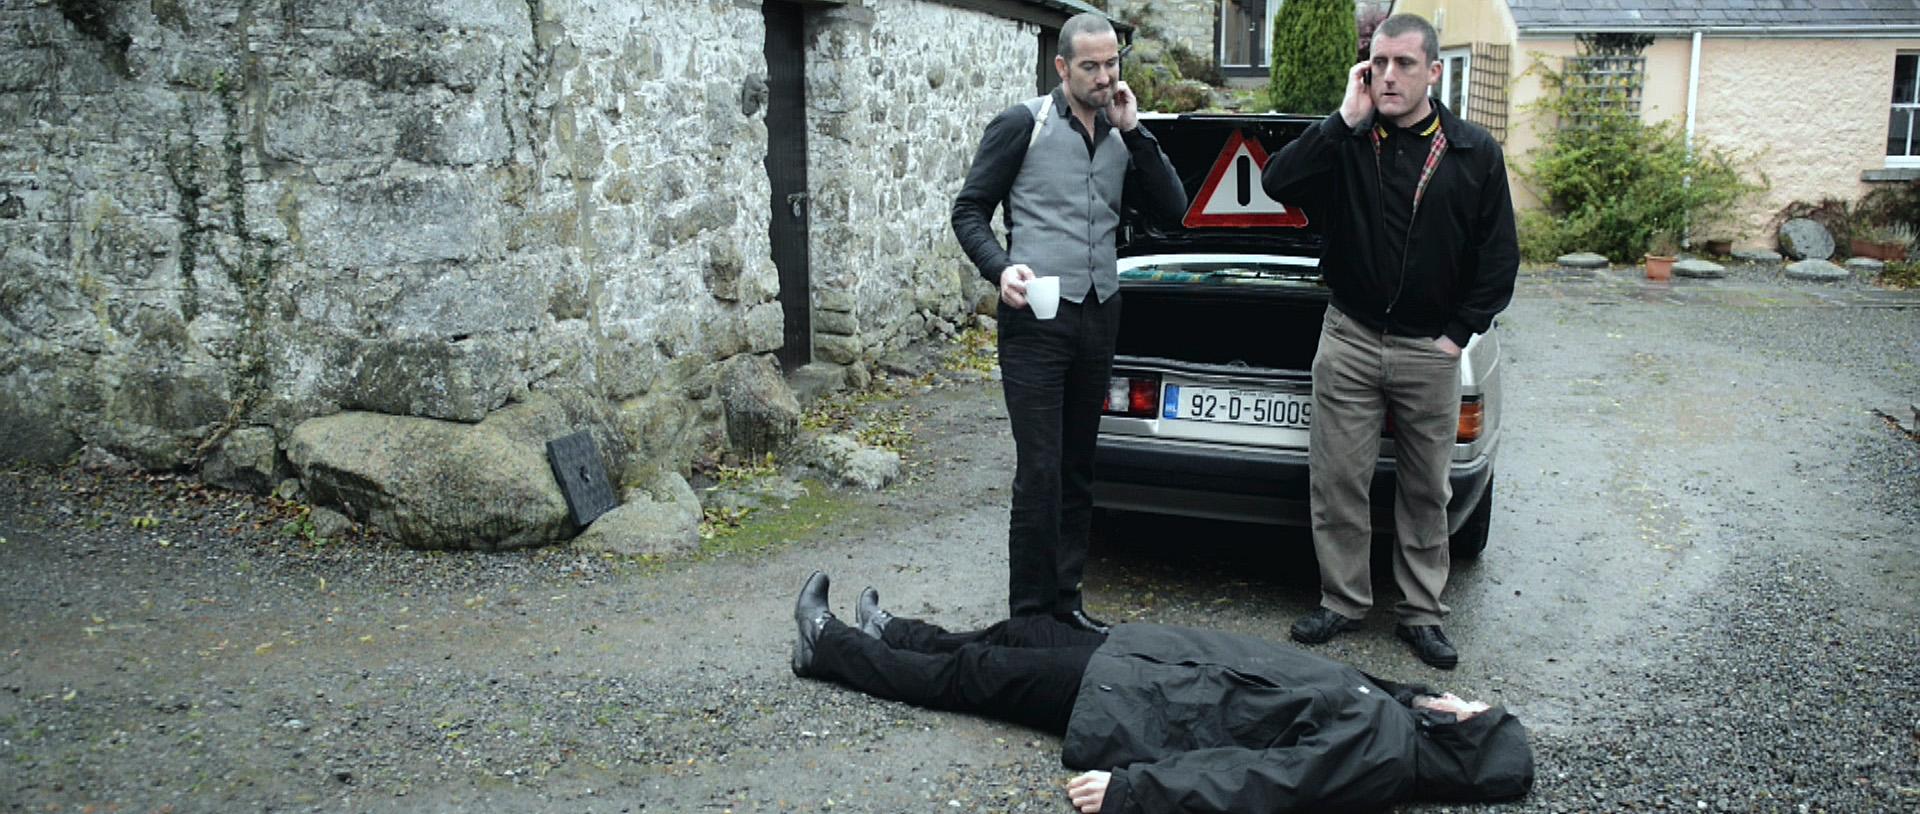 Network-Ireland-Television-Hit-Producer-THP-NITV-5.jpg